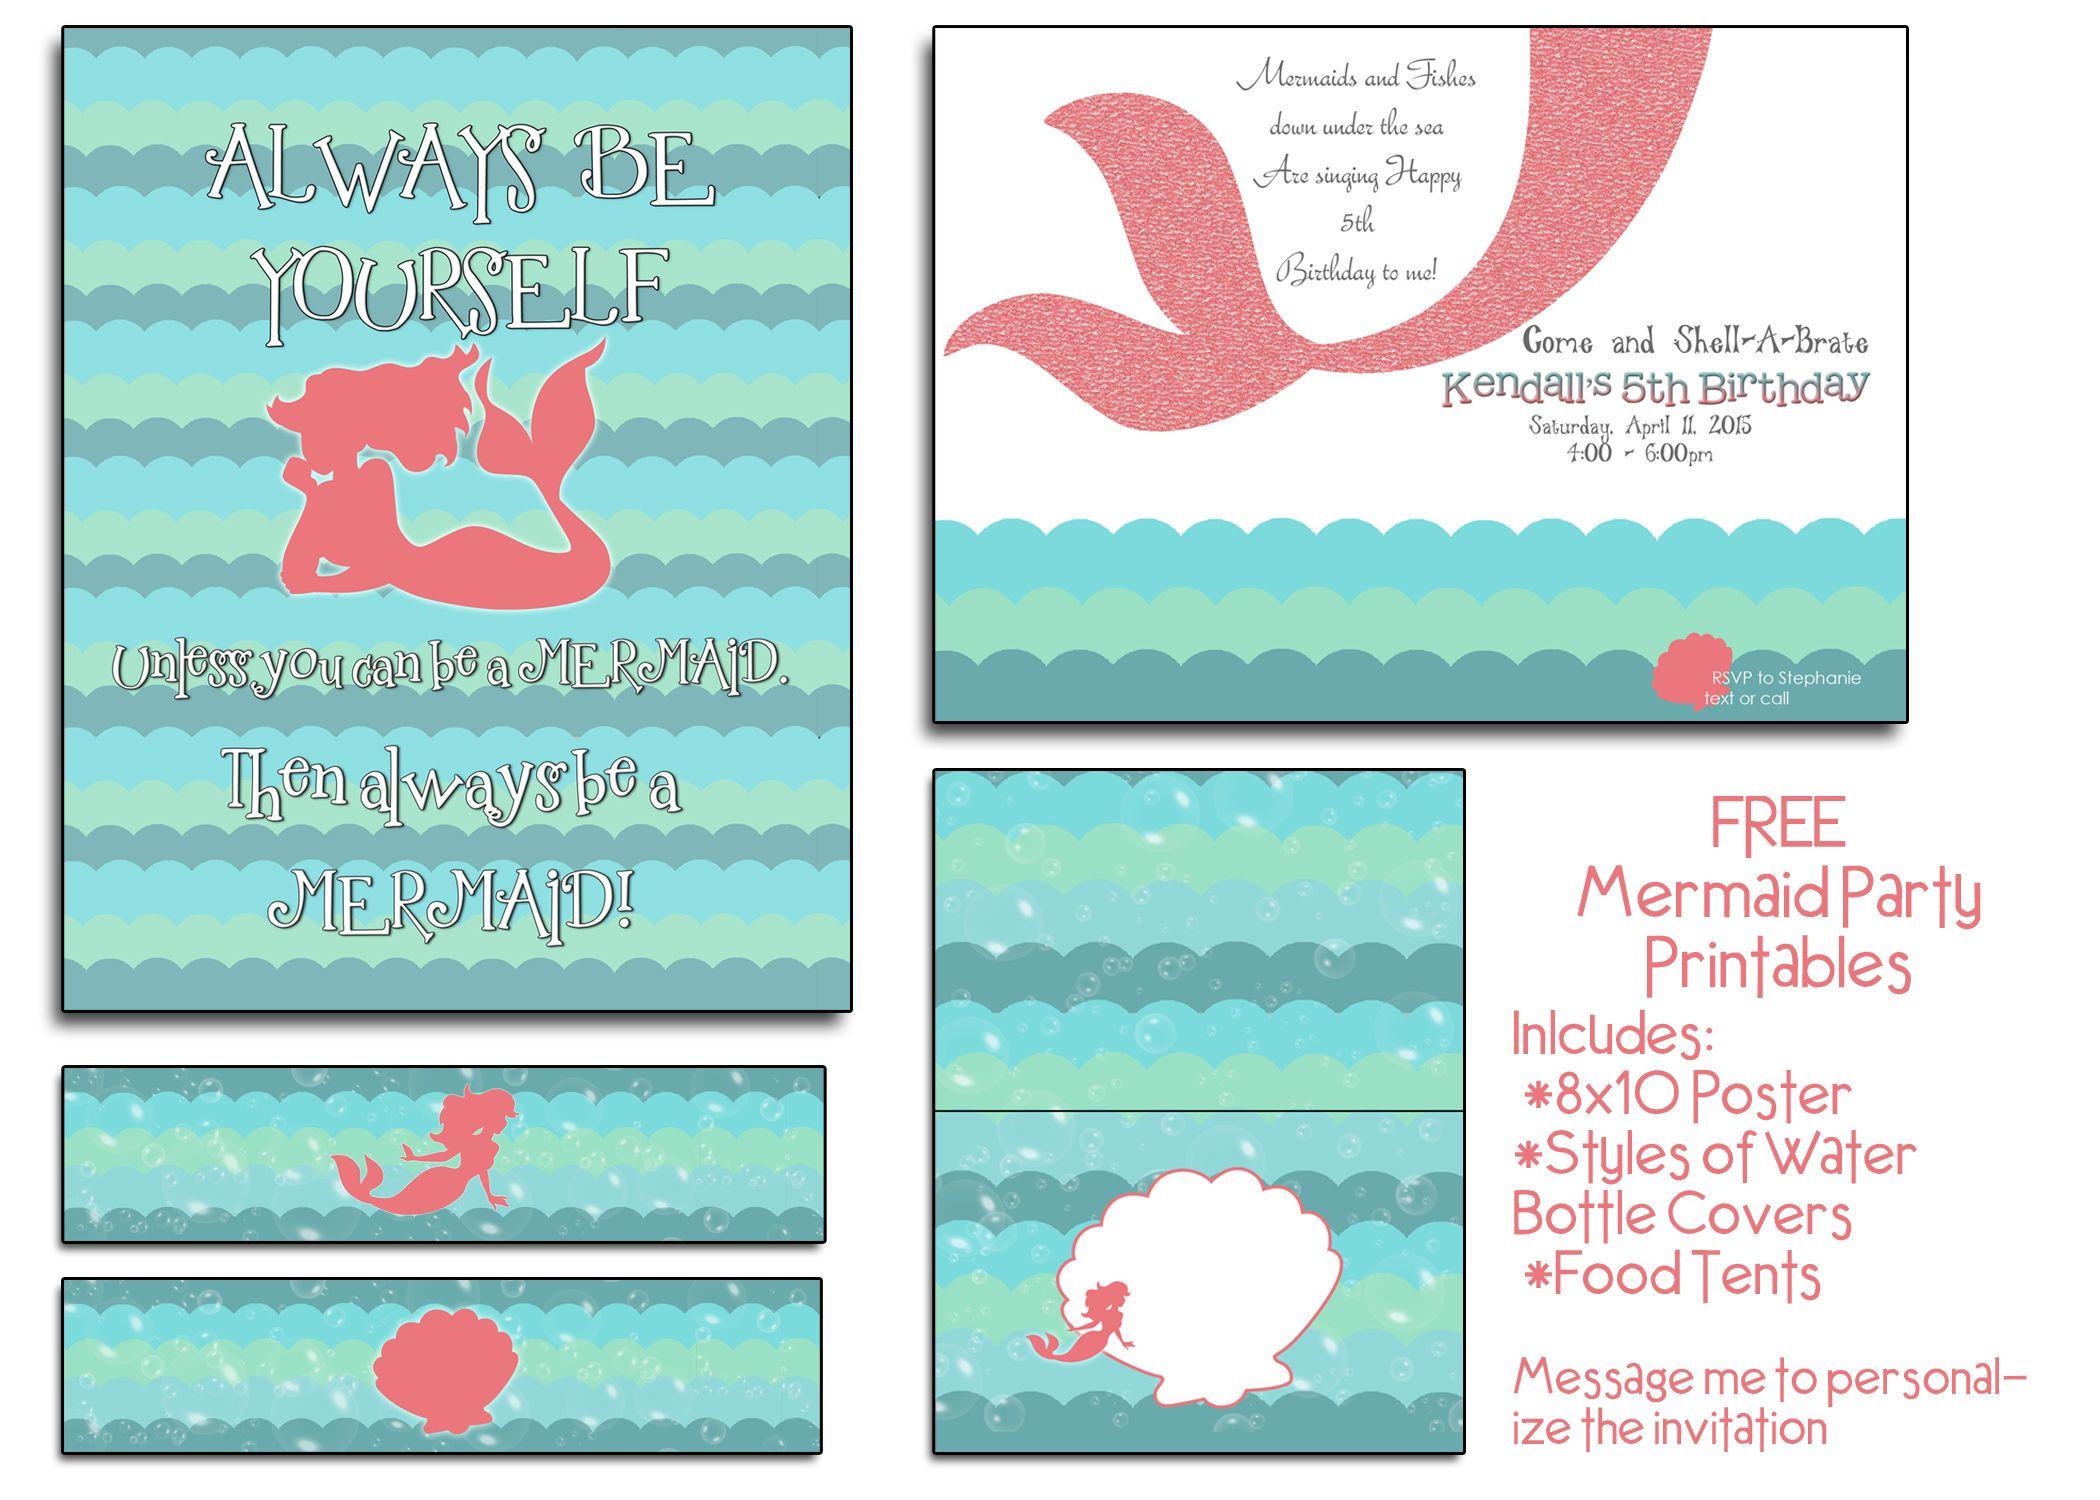 photo relating to Mermaid Birthday Invitations Free Printable identify Totally free Mermaid Social gathering Printables